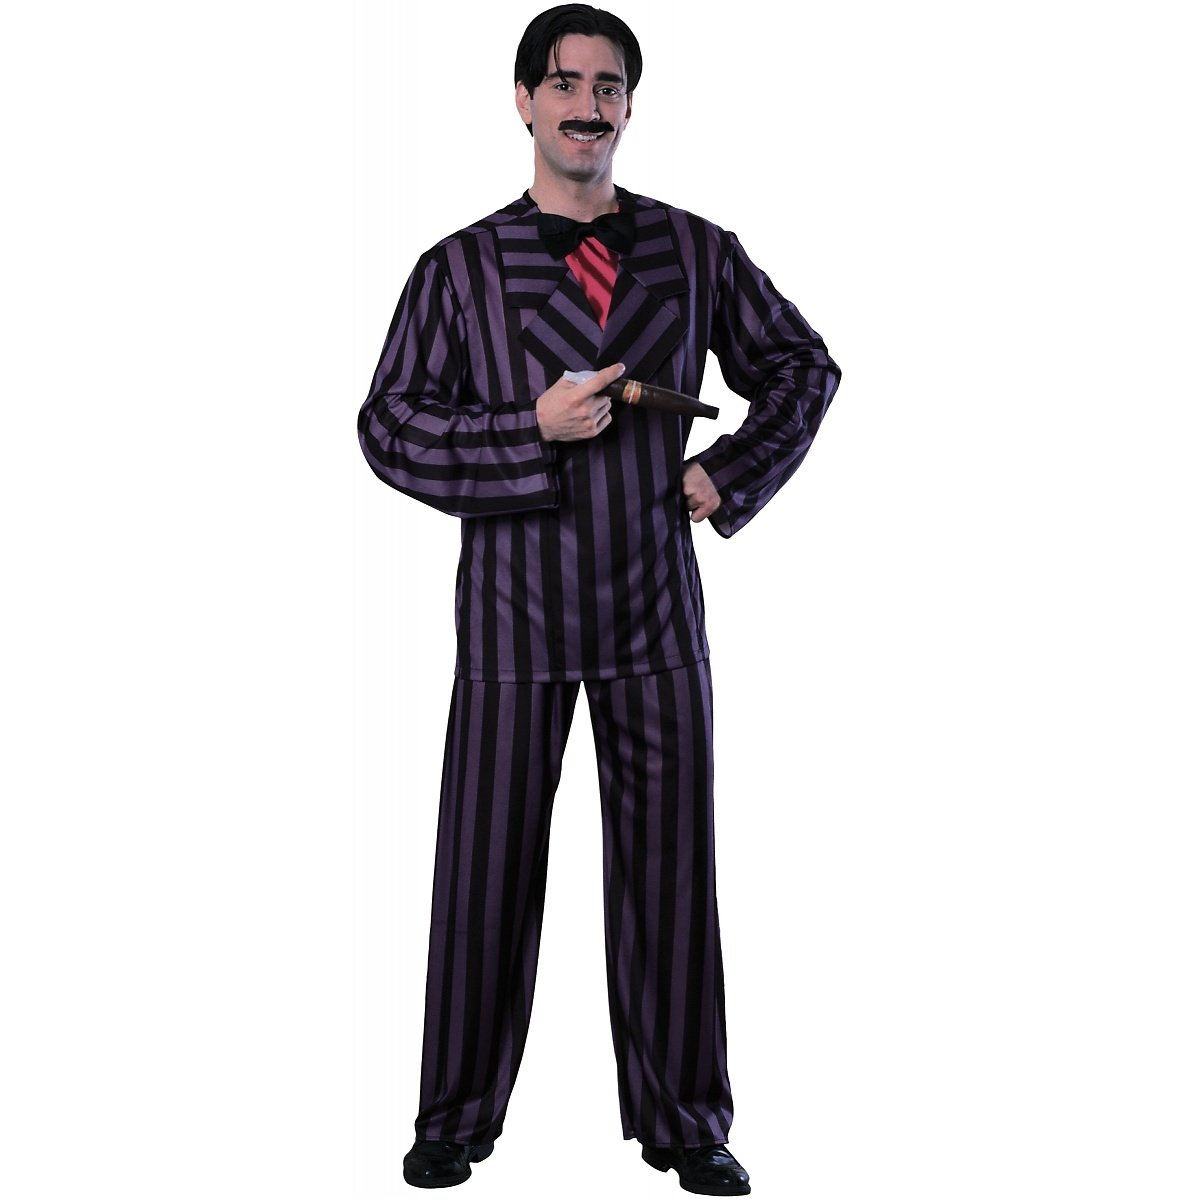 sc 1 st  Amazon.com & Amazon.com: Rubieu0027s The Addams Family Gomez Adams Costume: Clothing